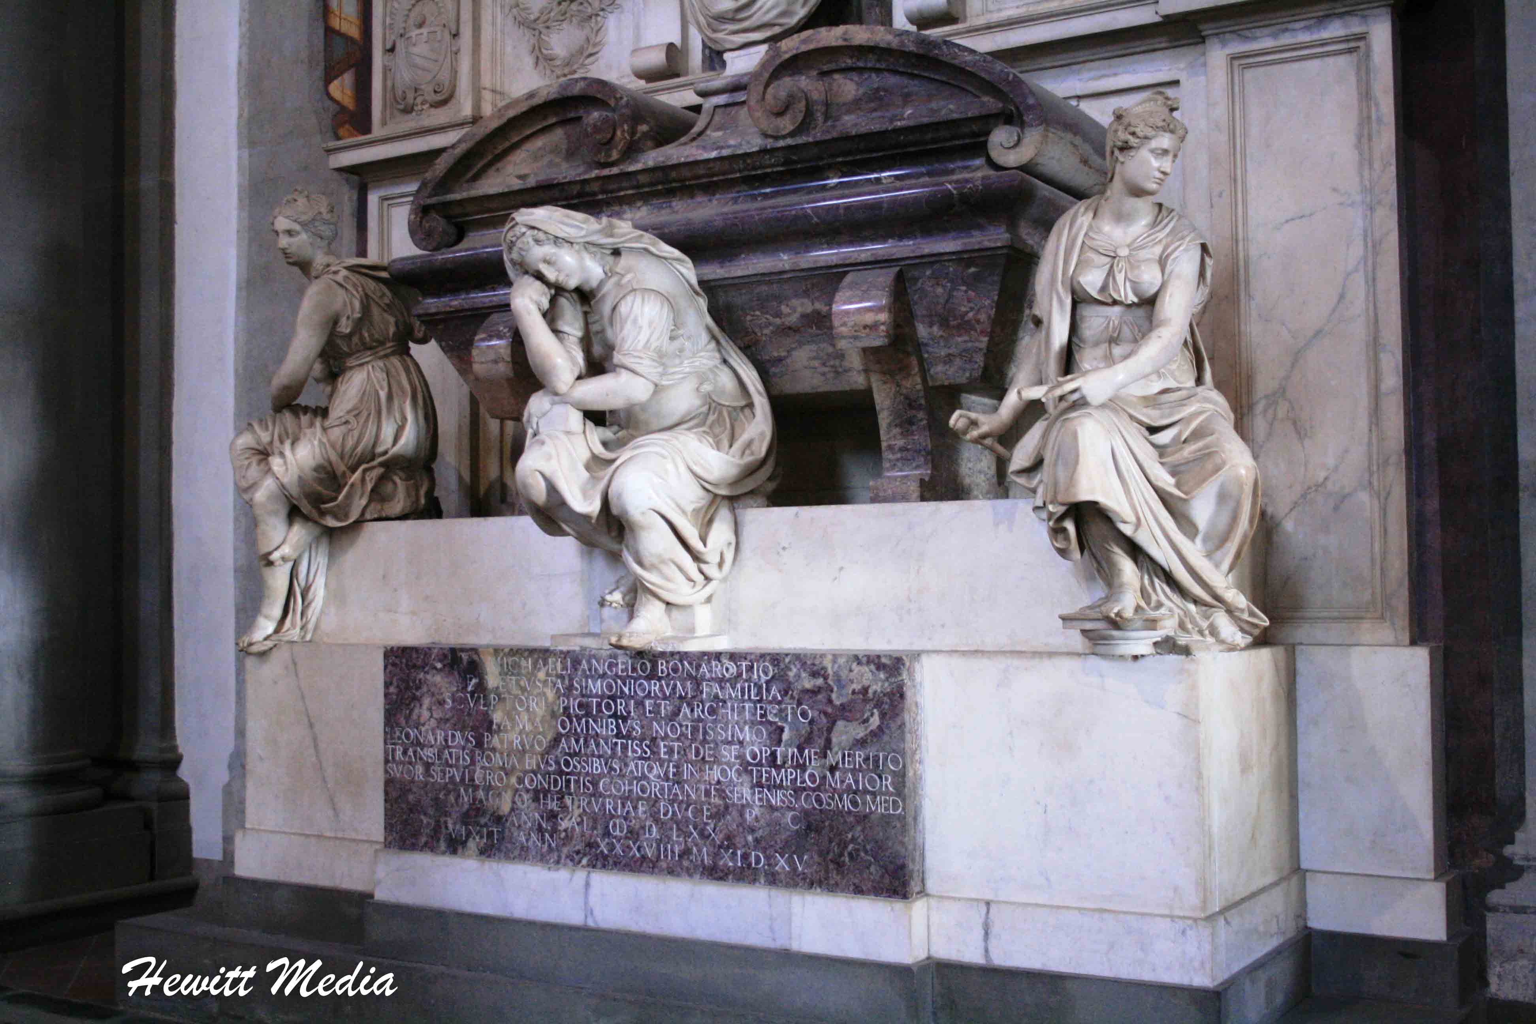 The Tomb of Michelangelo